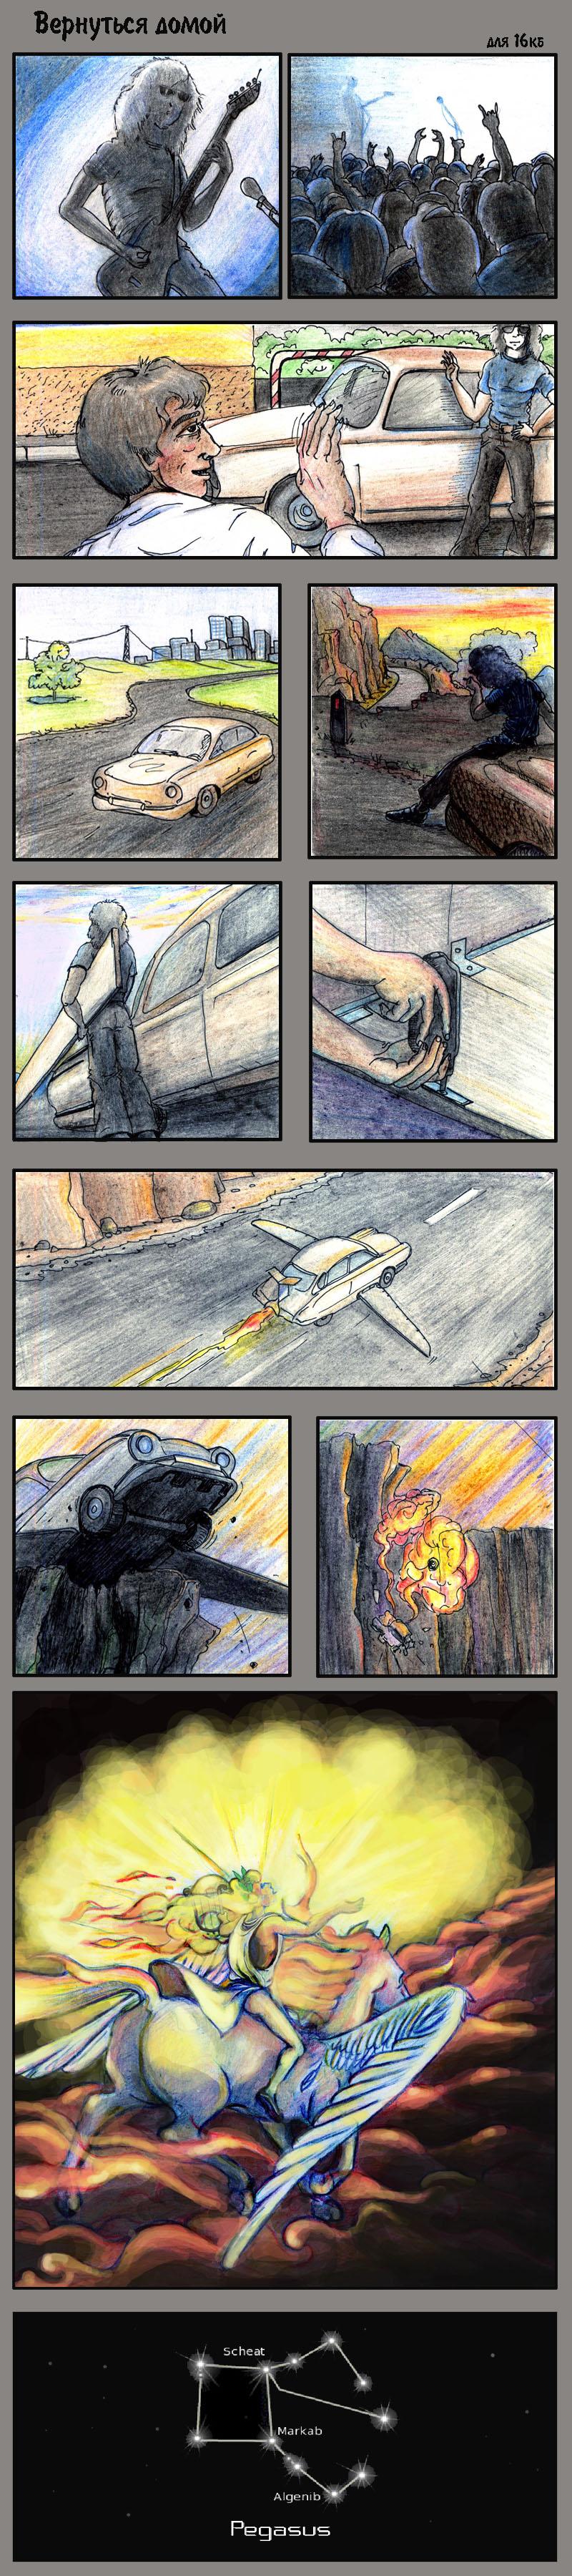 Комикс битва №16 выпуск 104